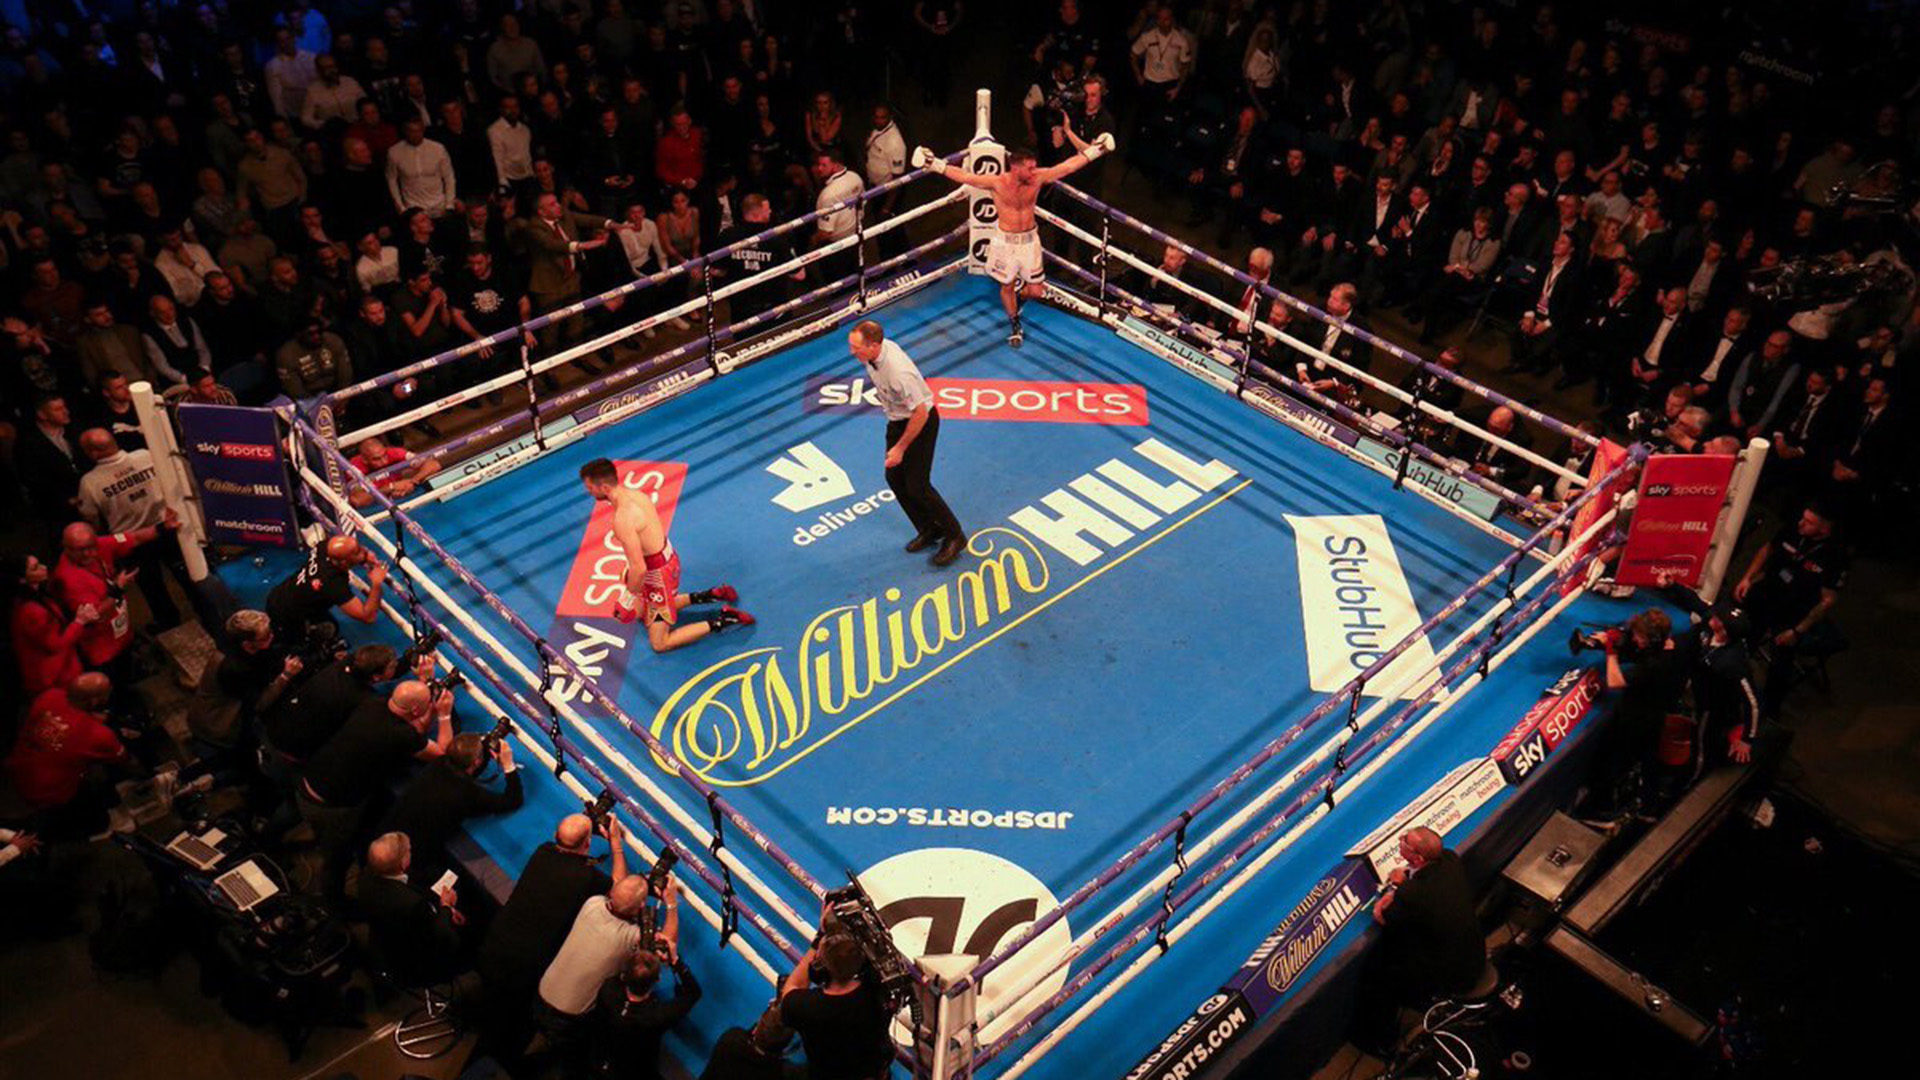 Scott Fitzgerald logró el cinturón en la categoría superwelter del Campeonato Internacional WBA de(Twitter: @Scottfitz91)